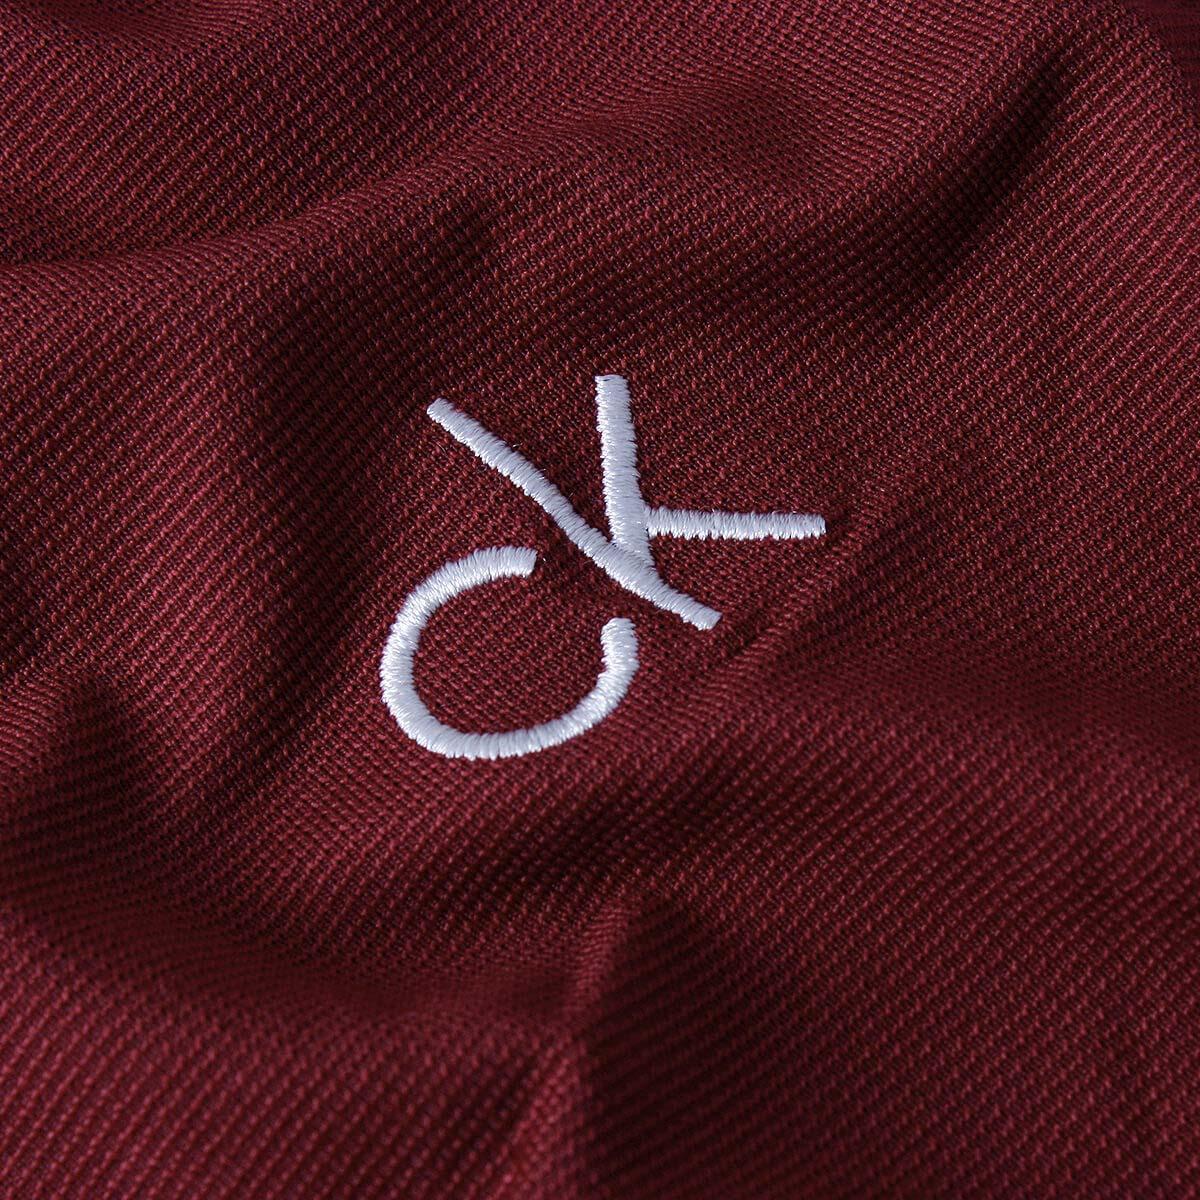 thumbnail 7 - Calvin Klein Mens 2021 Central Eco Light Wicking Golf Polo Shirt 28% OFF RRP